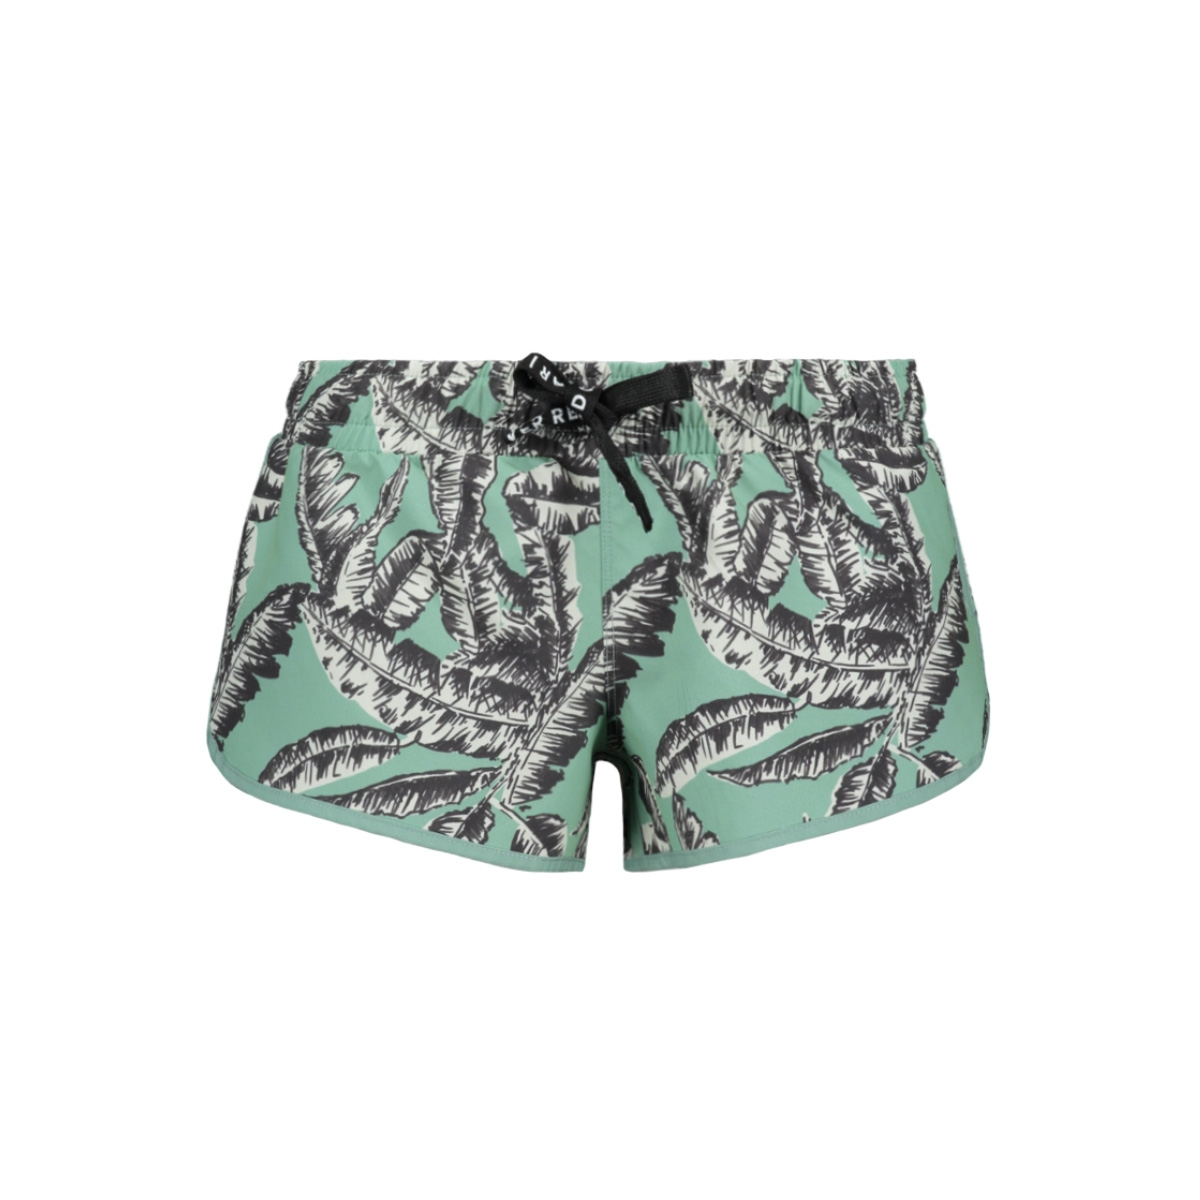 surf shorts 20 204 0201 10 days korte broek 1070 blue surf